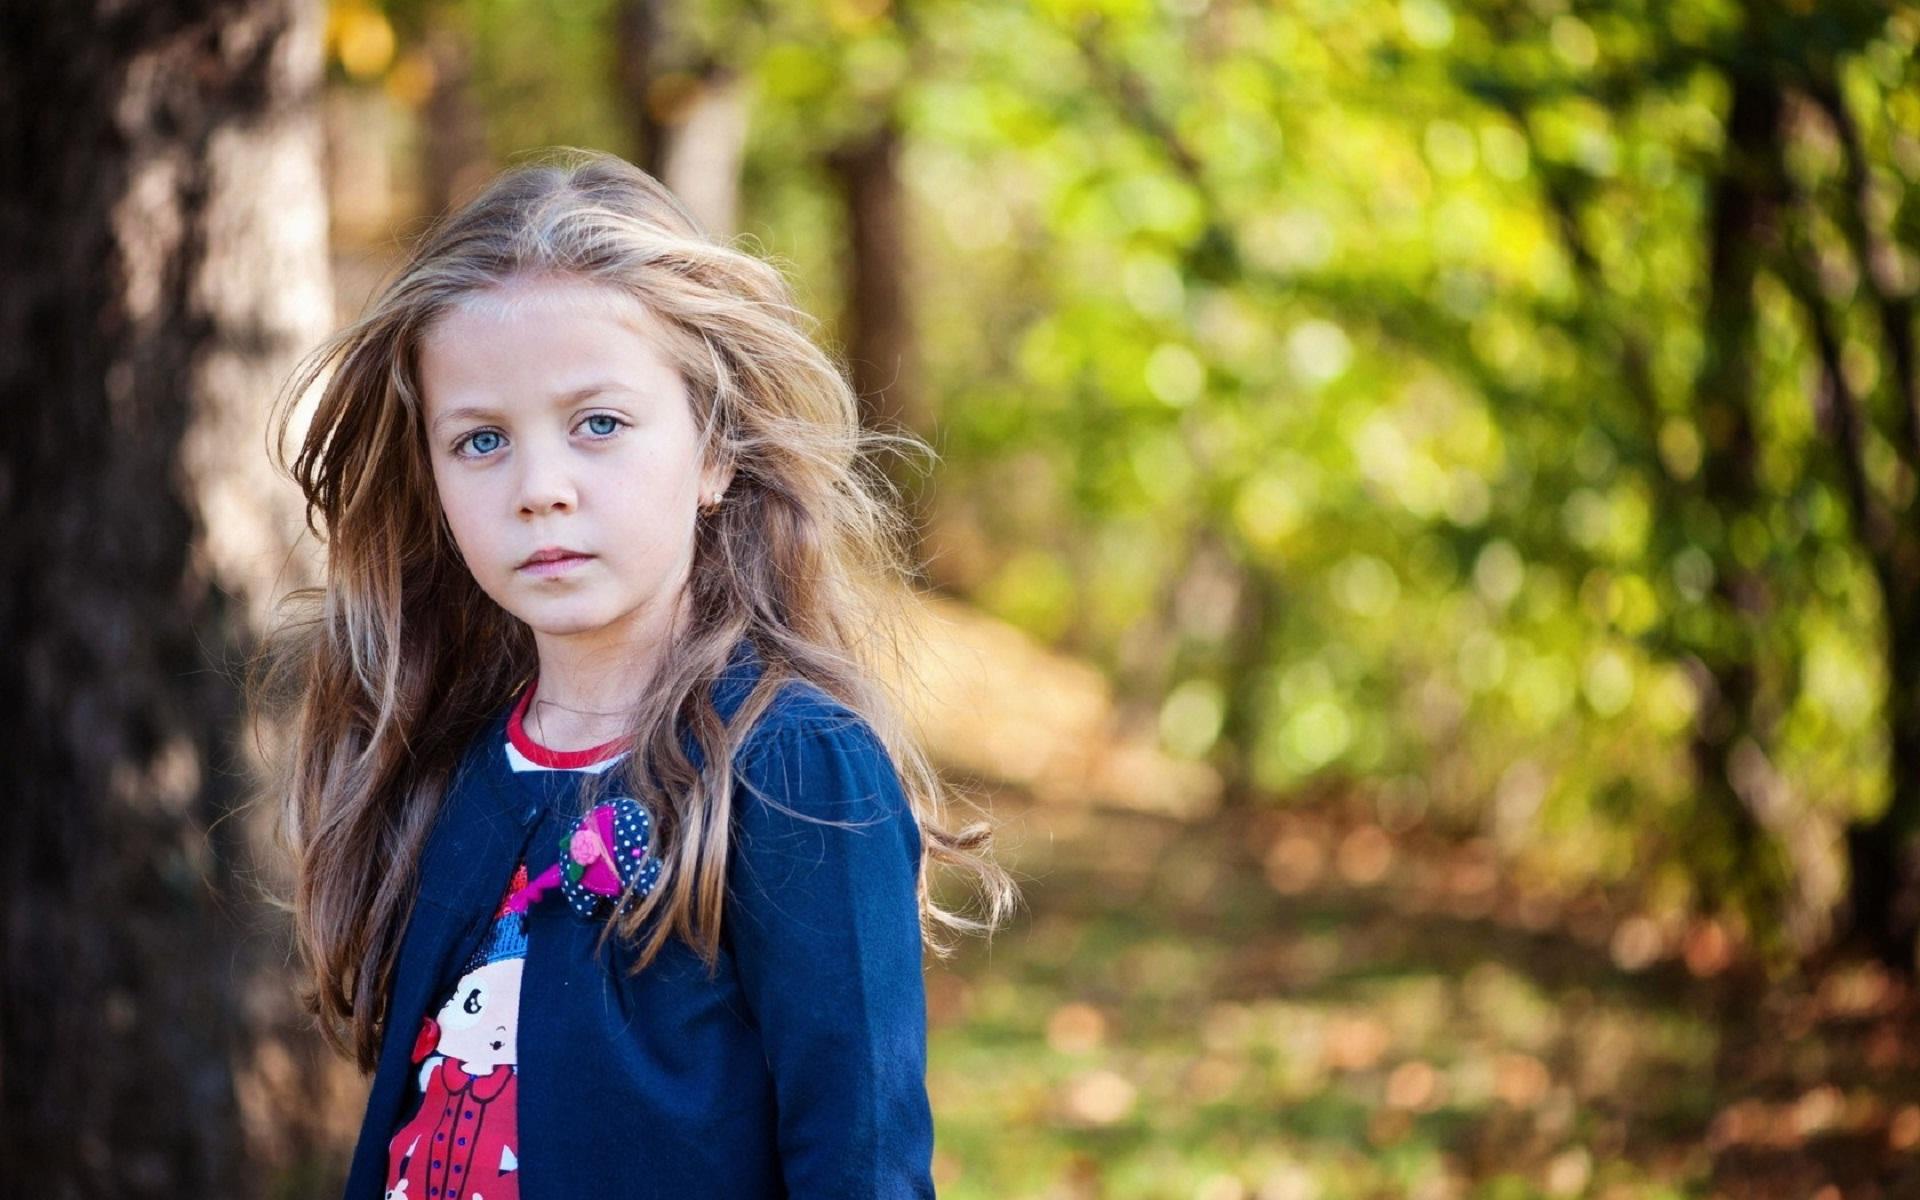 Innocent baby in tree field 1